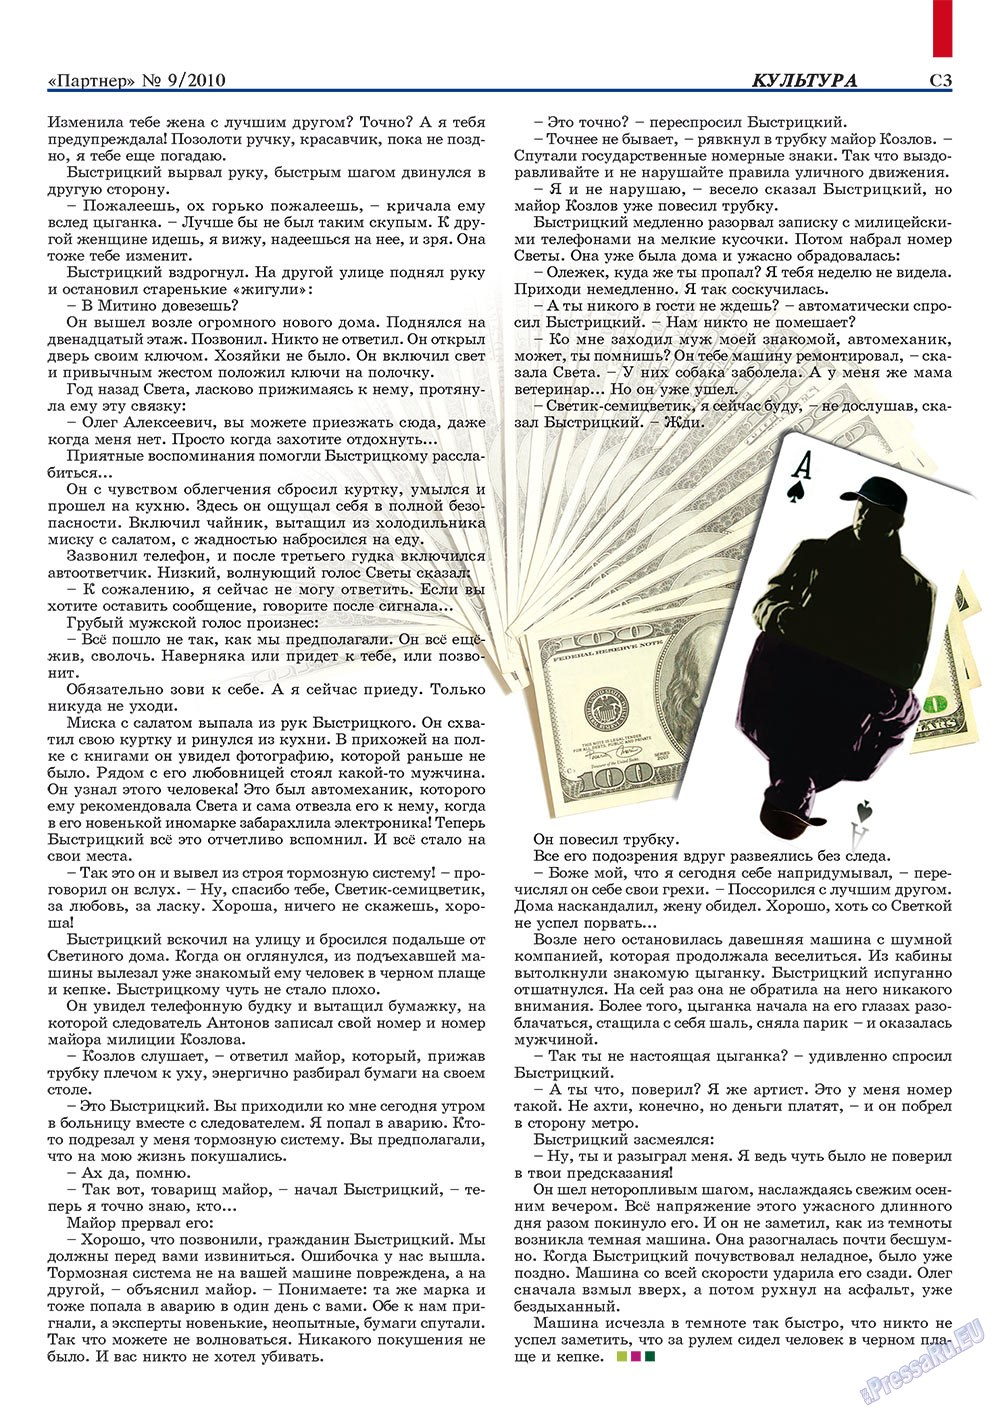 Партнер-север (журнал). 2010 год, номер 9, стр. 61